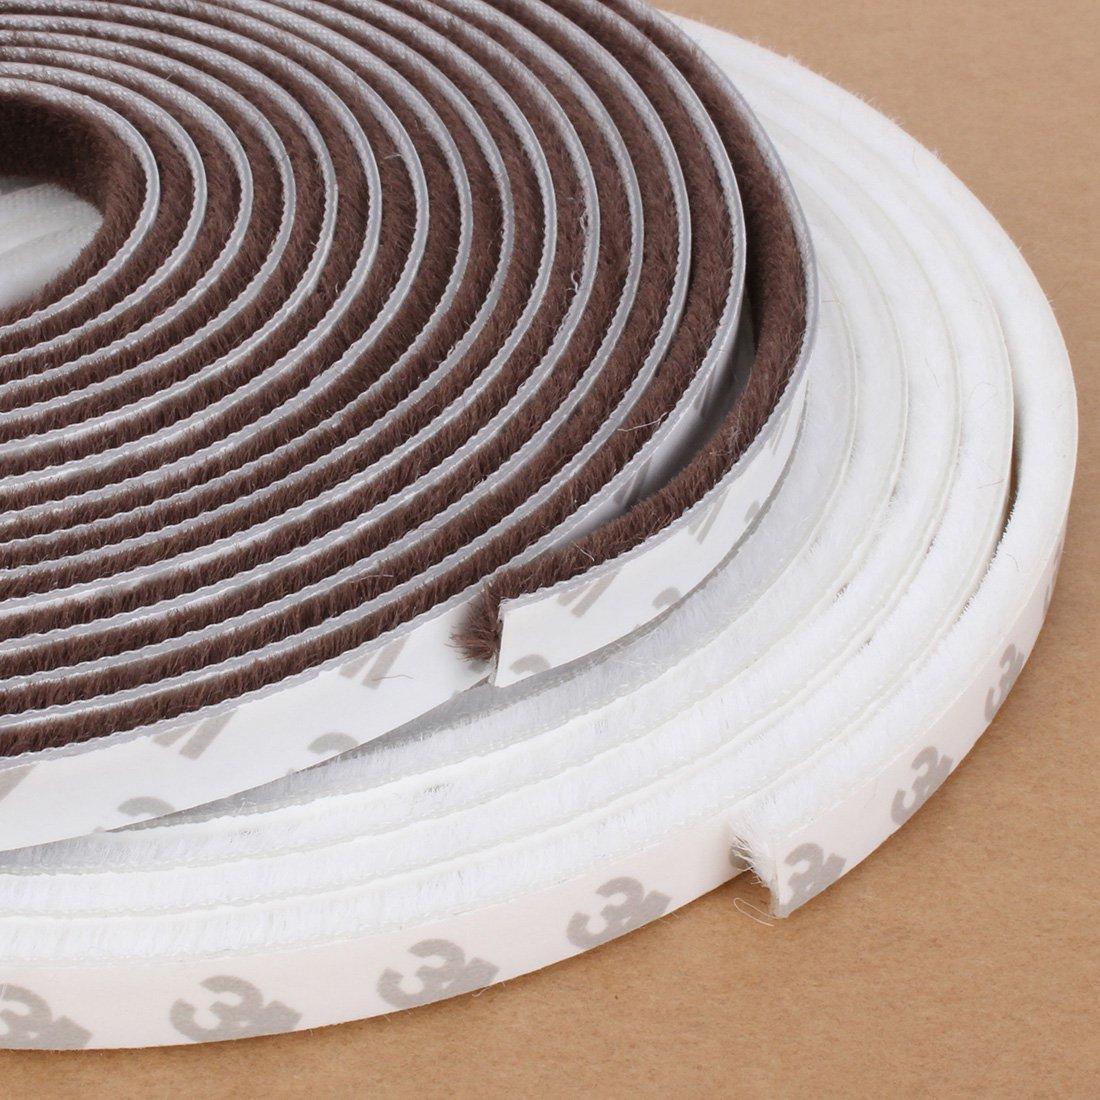 5m Self Adhesive Draught Excluder Brush Window Pile Seal Film Door Weather Strip Brown Color